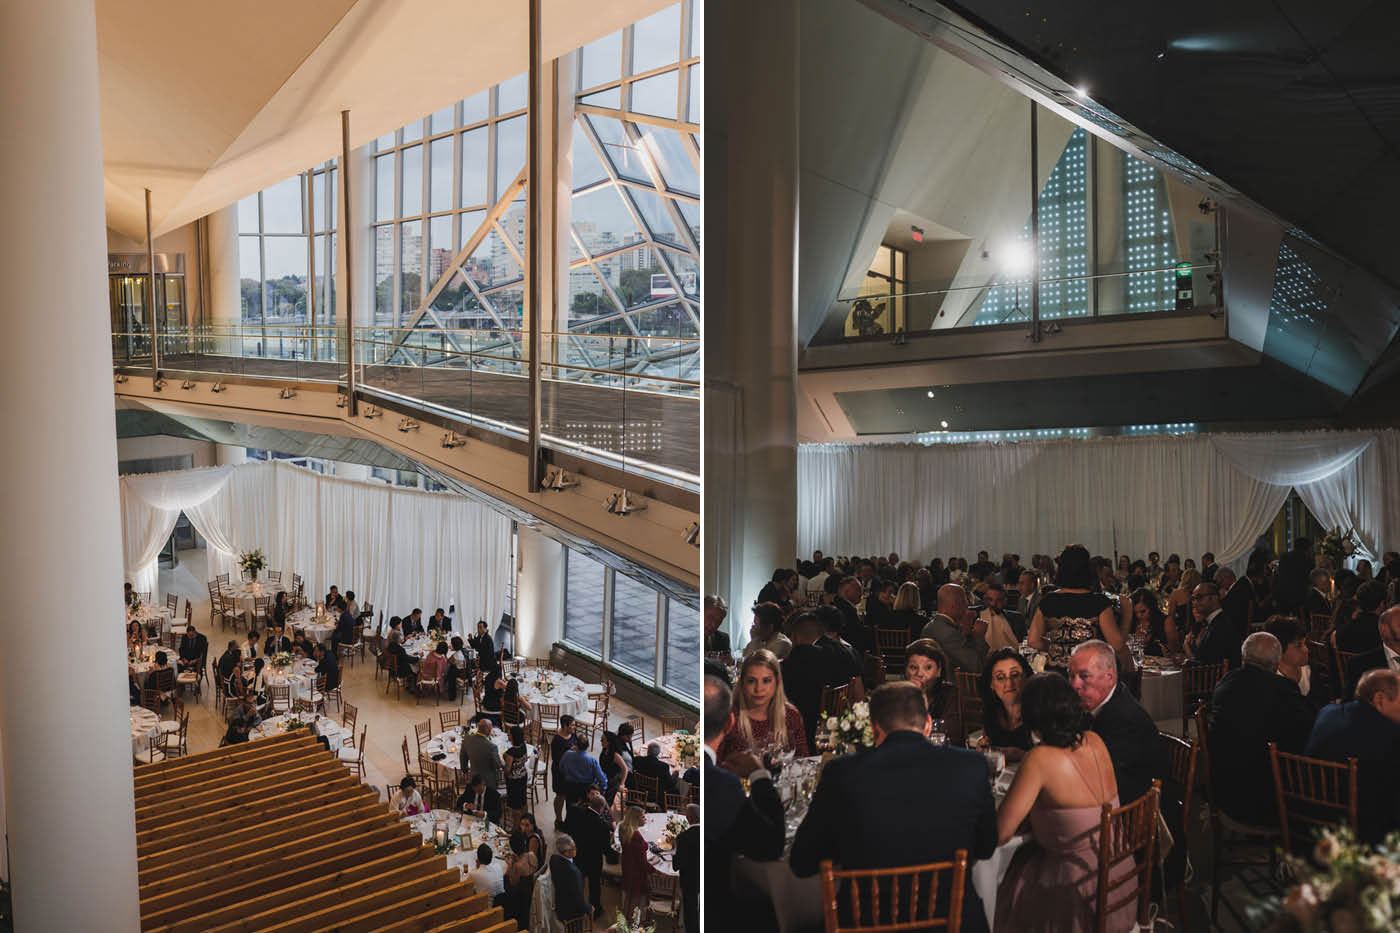 cira centre wedding reception at a wedding at Saint Thomas of Villanova by Weddings by Hanel